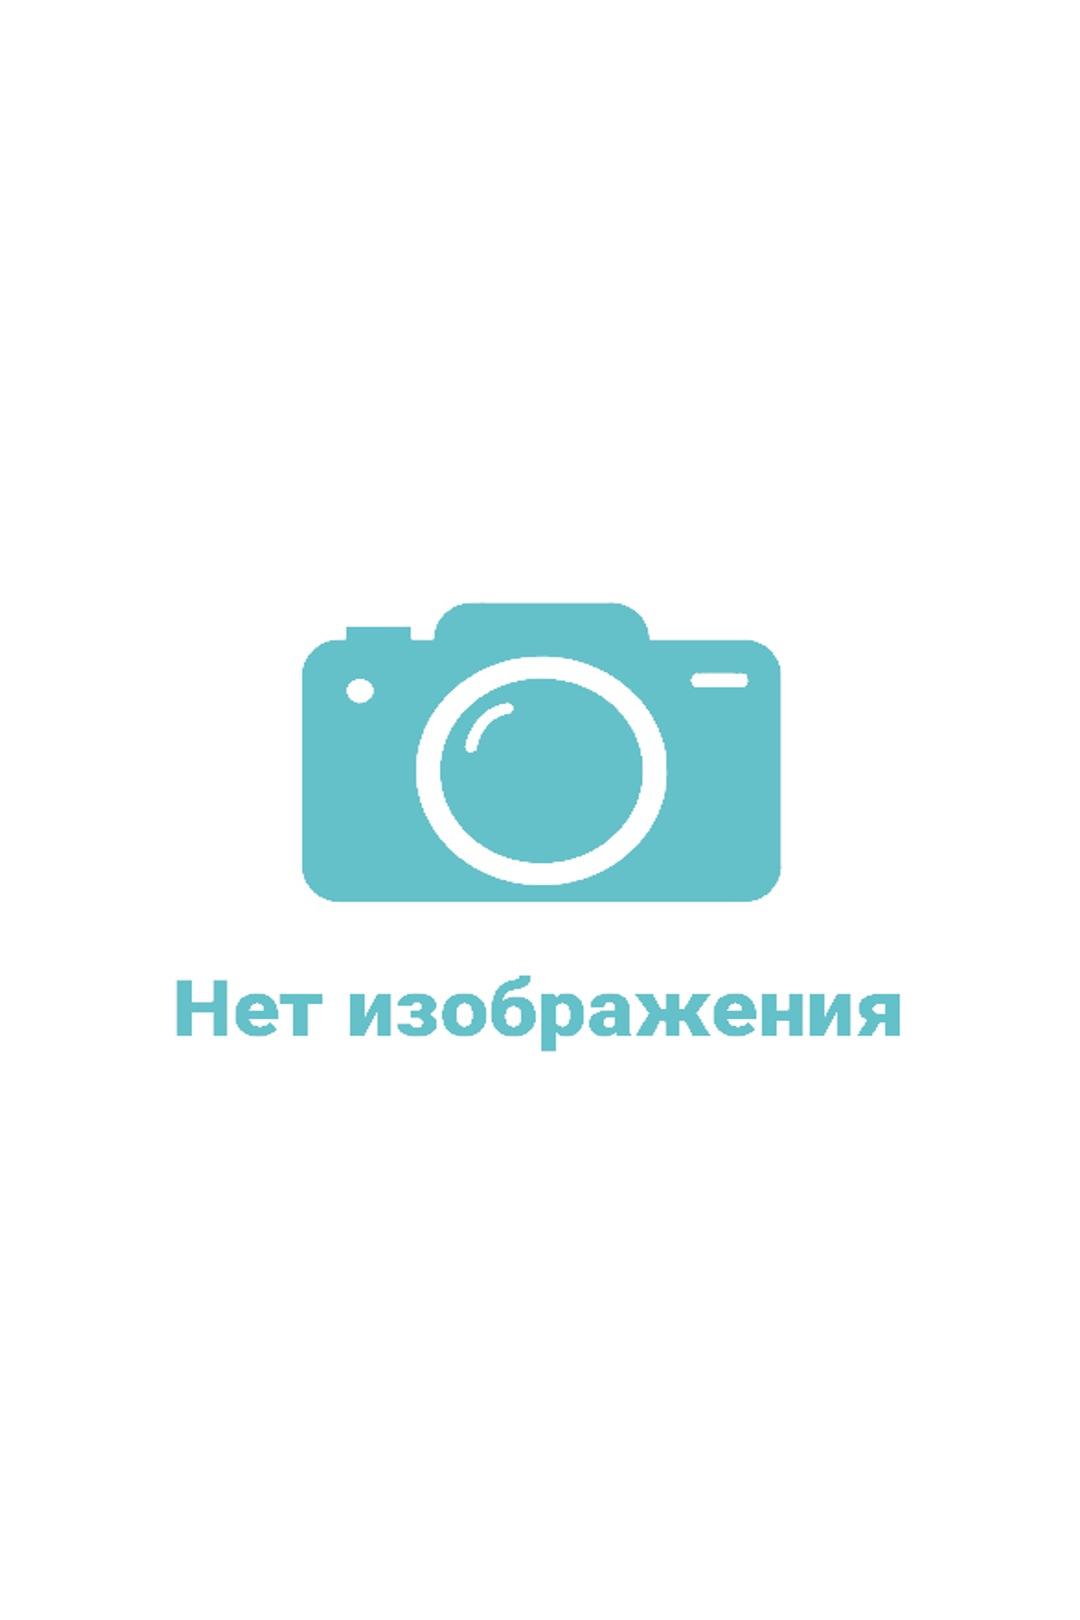 Врач УЗИ Кошелева Марина Анатольевна